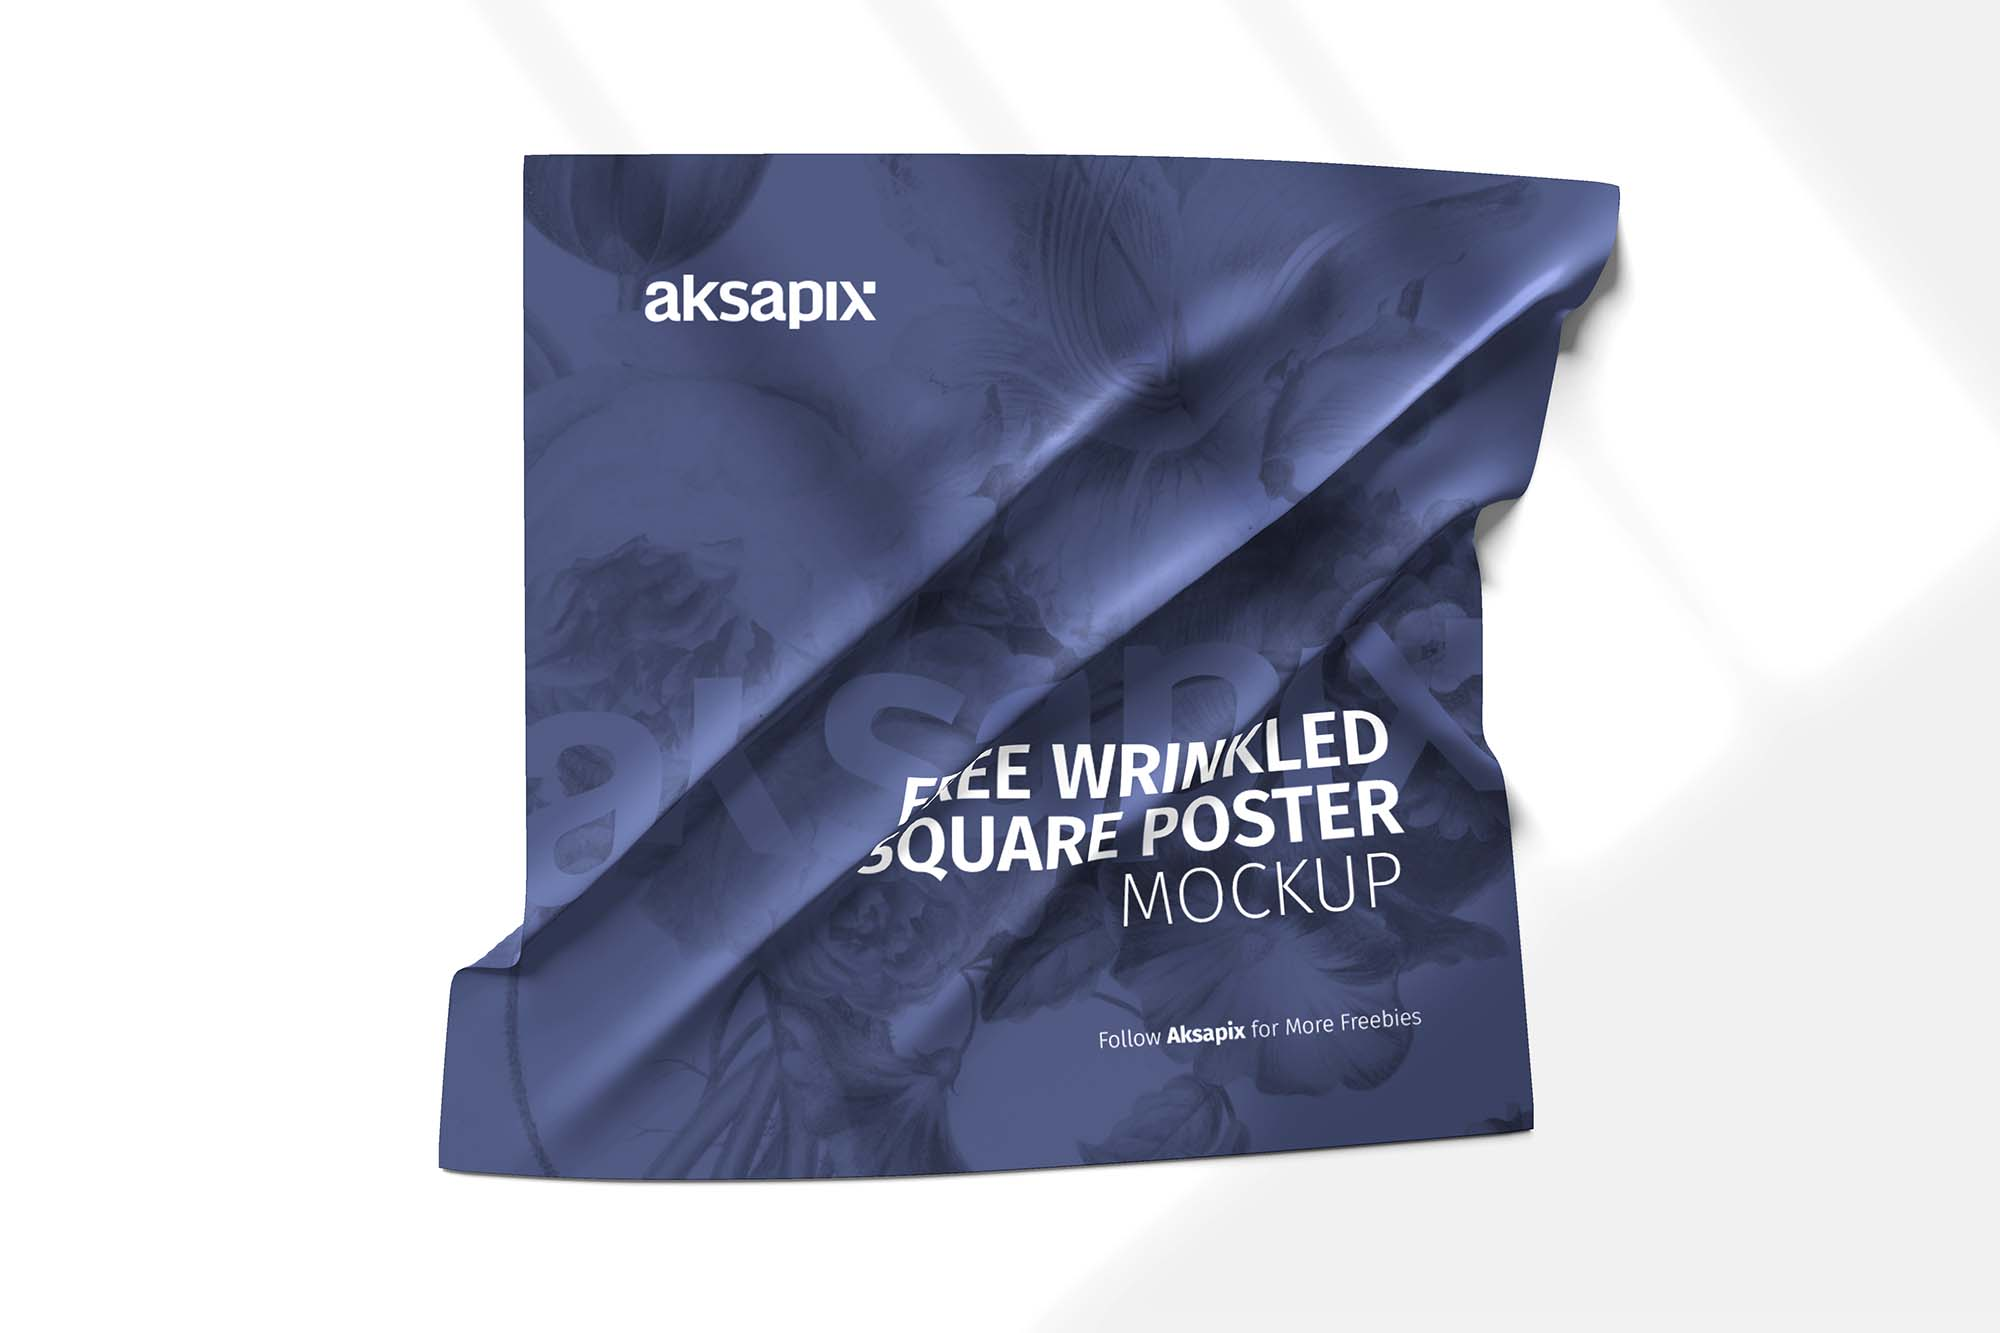 Wrinkled Square Poster Mockup